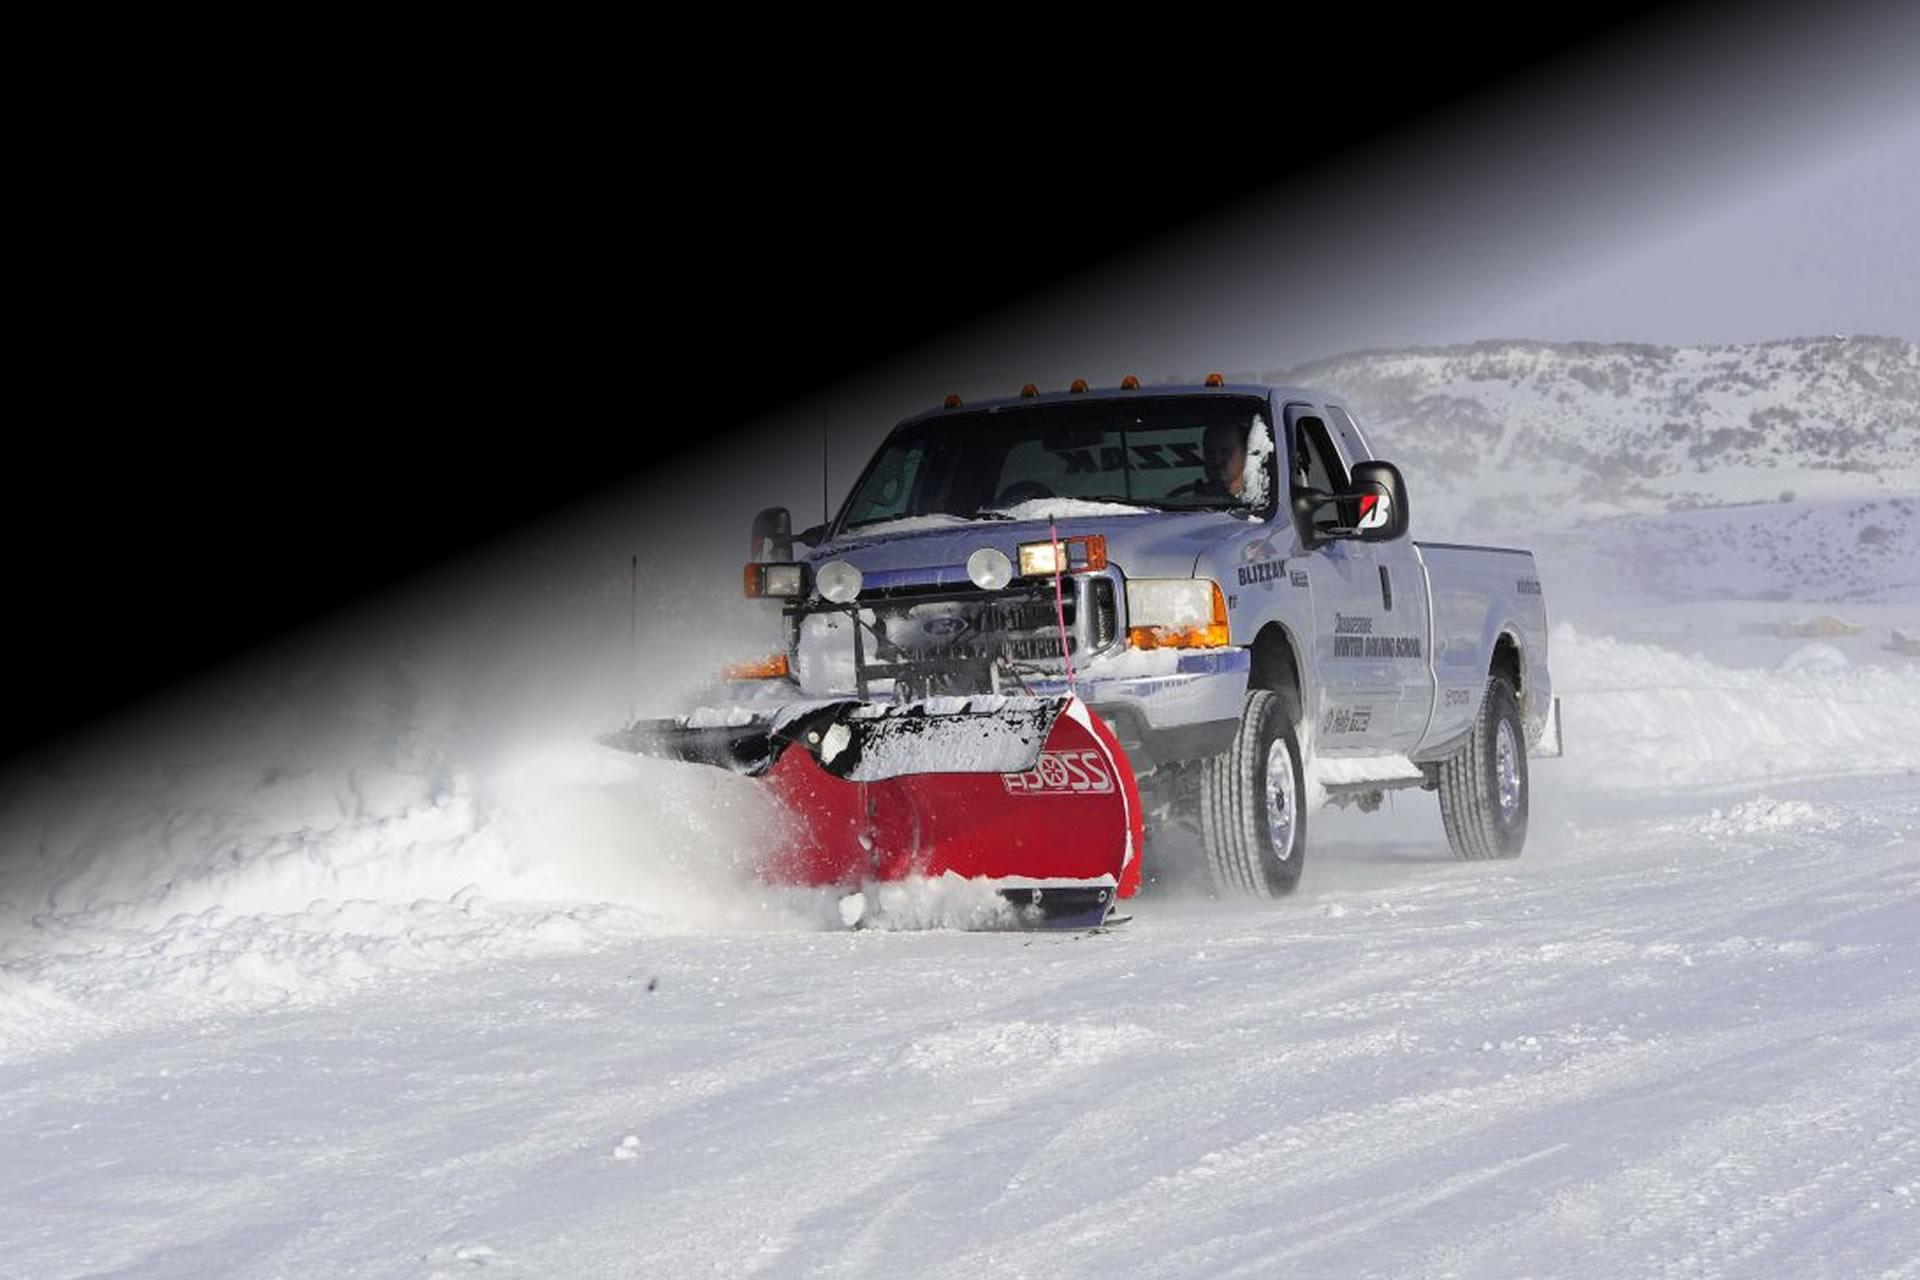 http://www.homesweethomelandscaping.com/sites/default/files/revslider/image/Slide03-Snow-Plowing_0.jpg